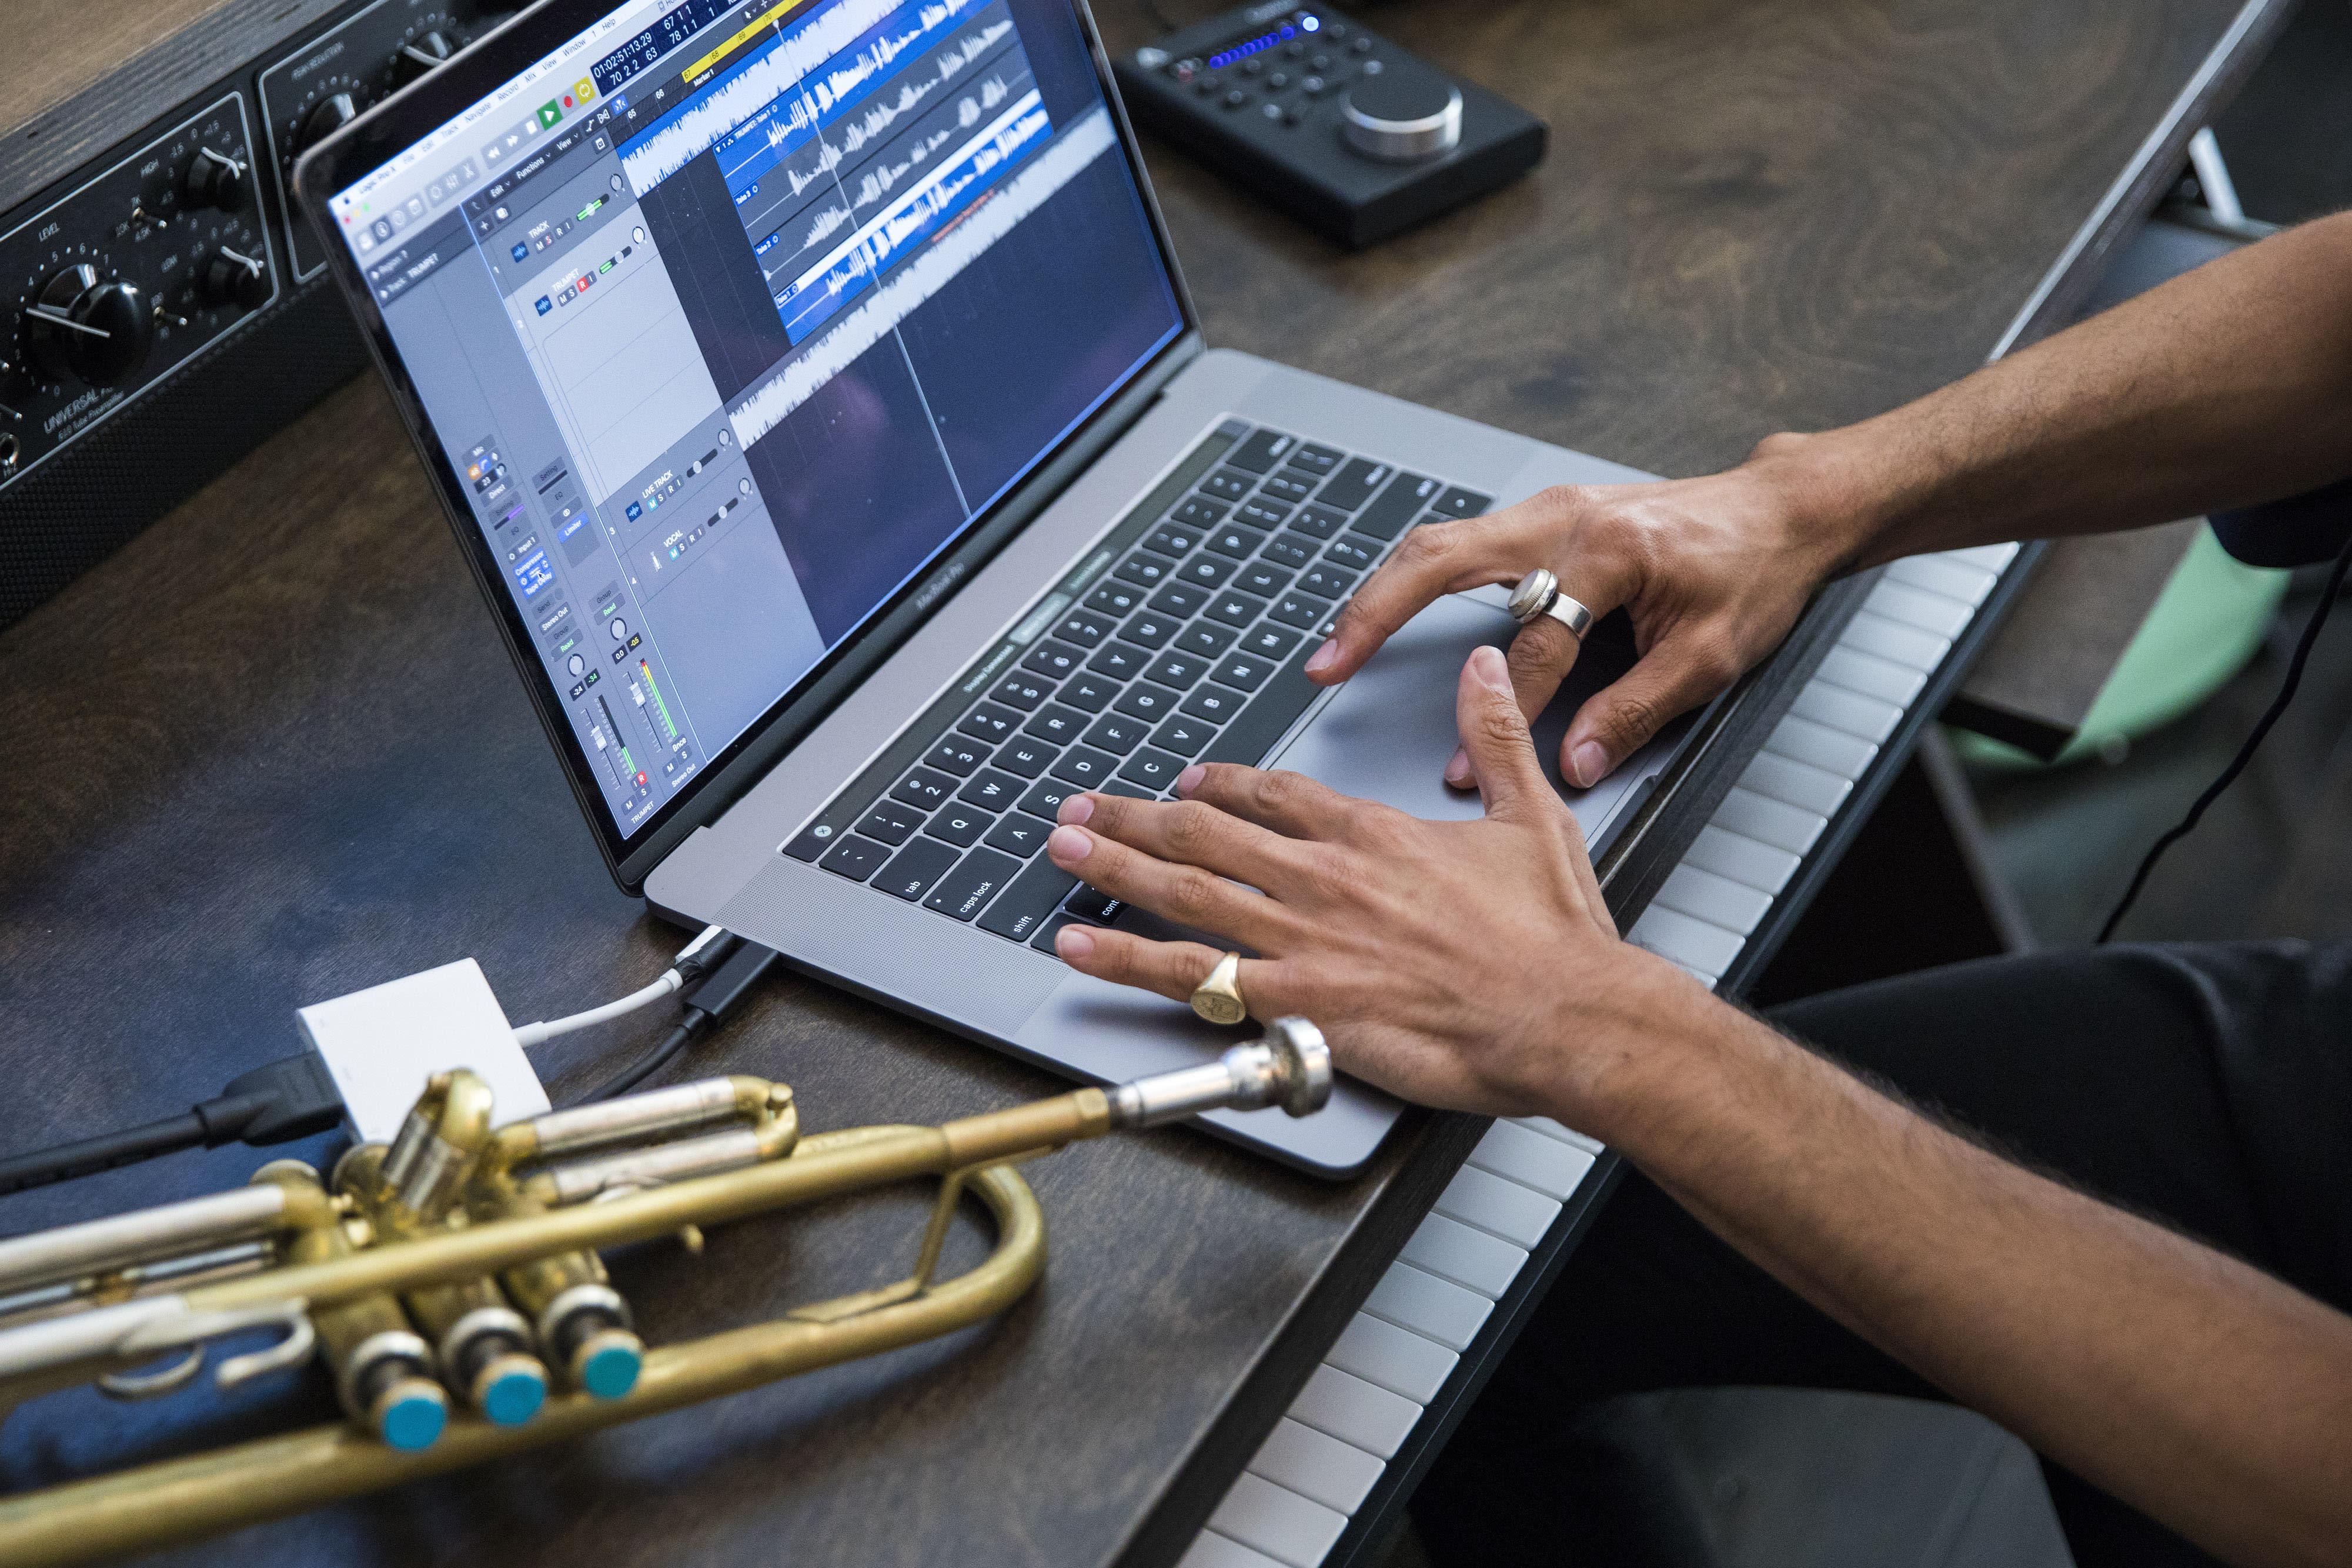 macbook pro 2018 review i9